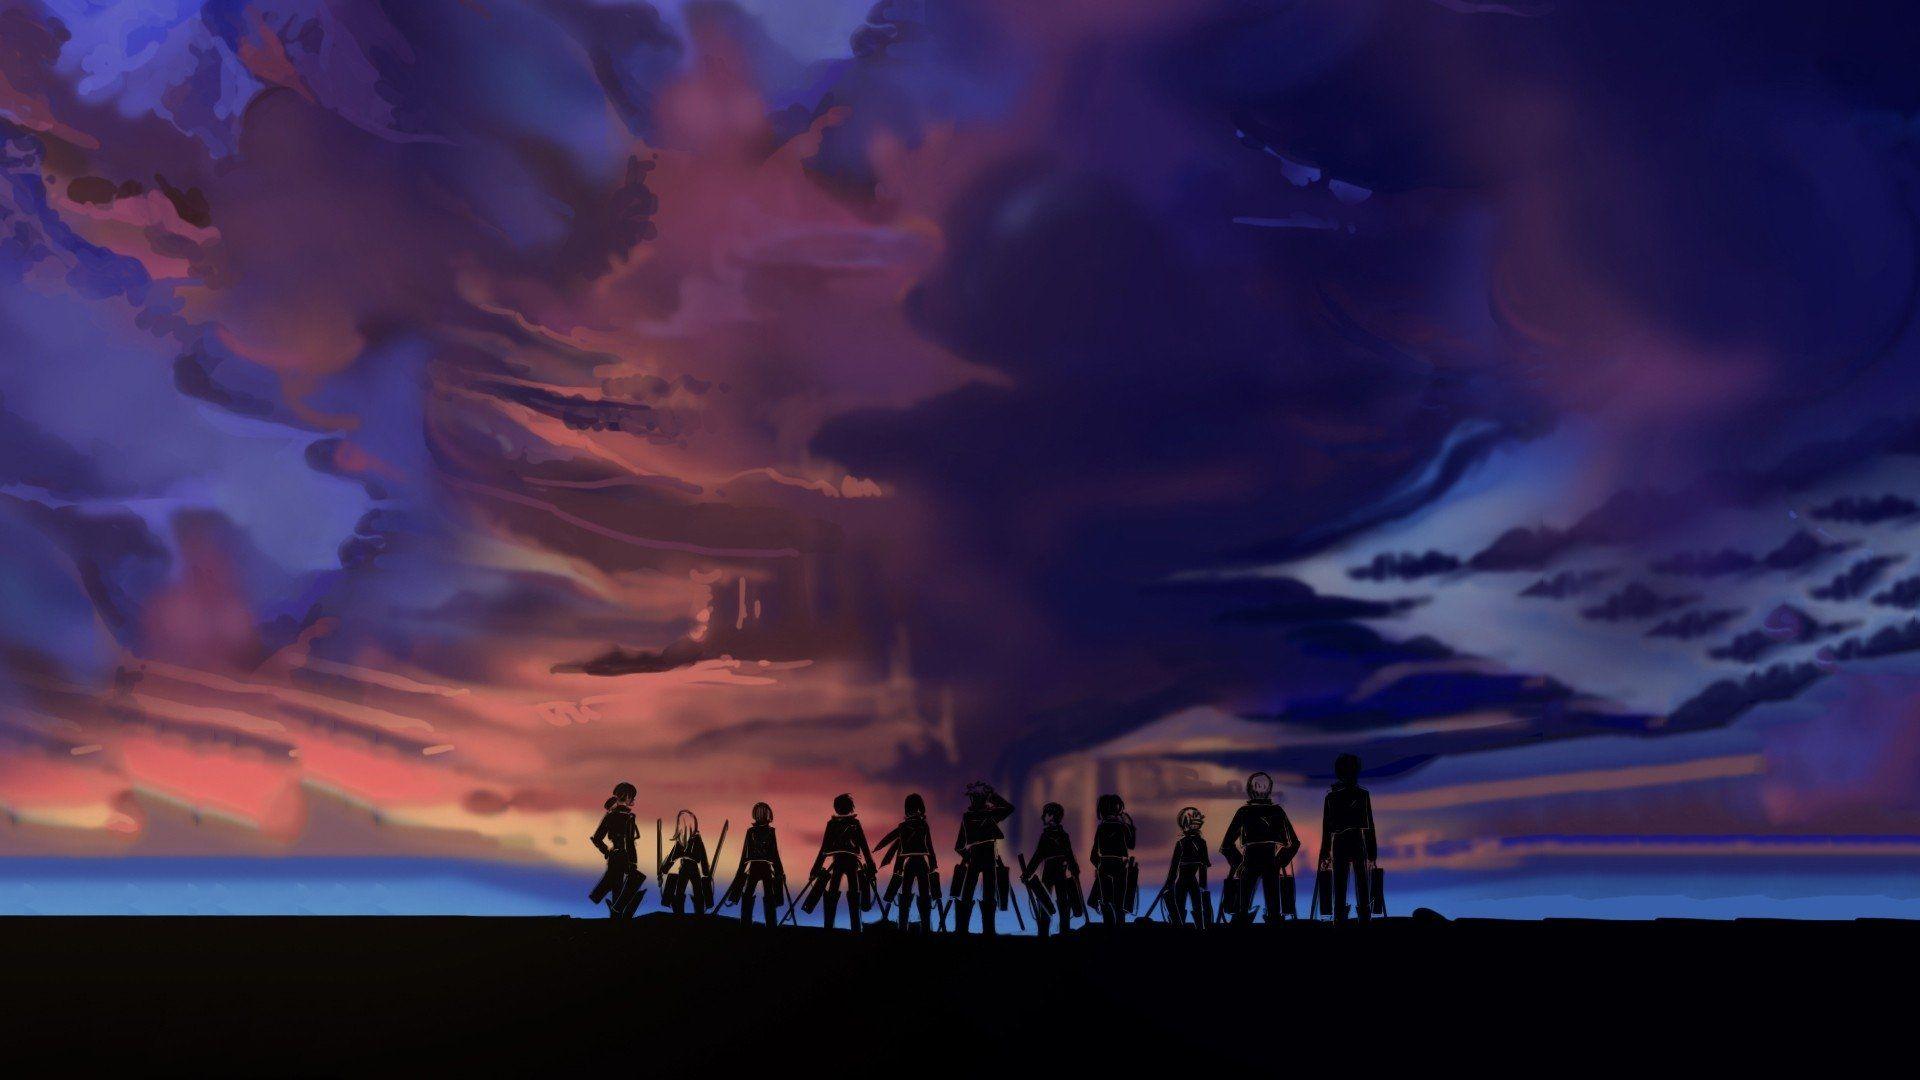 Anime Attack On Titan Wallpaper Attack On Titan Aesthetic Attack On Titan Attack On Titan Anime